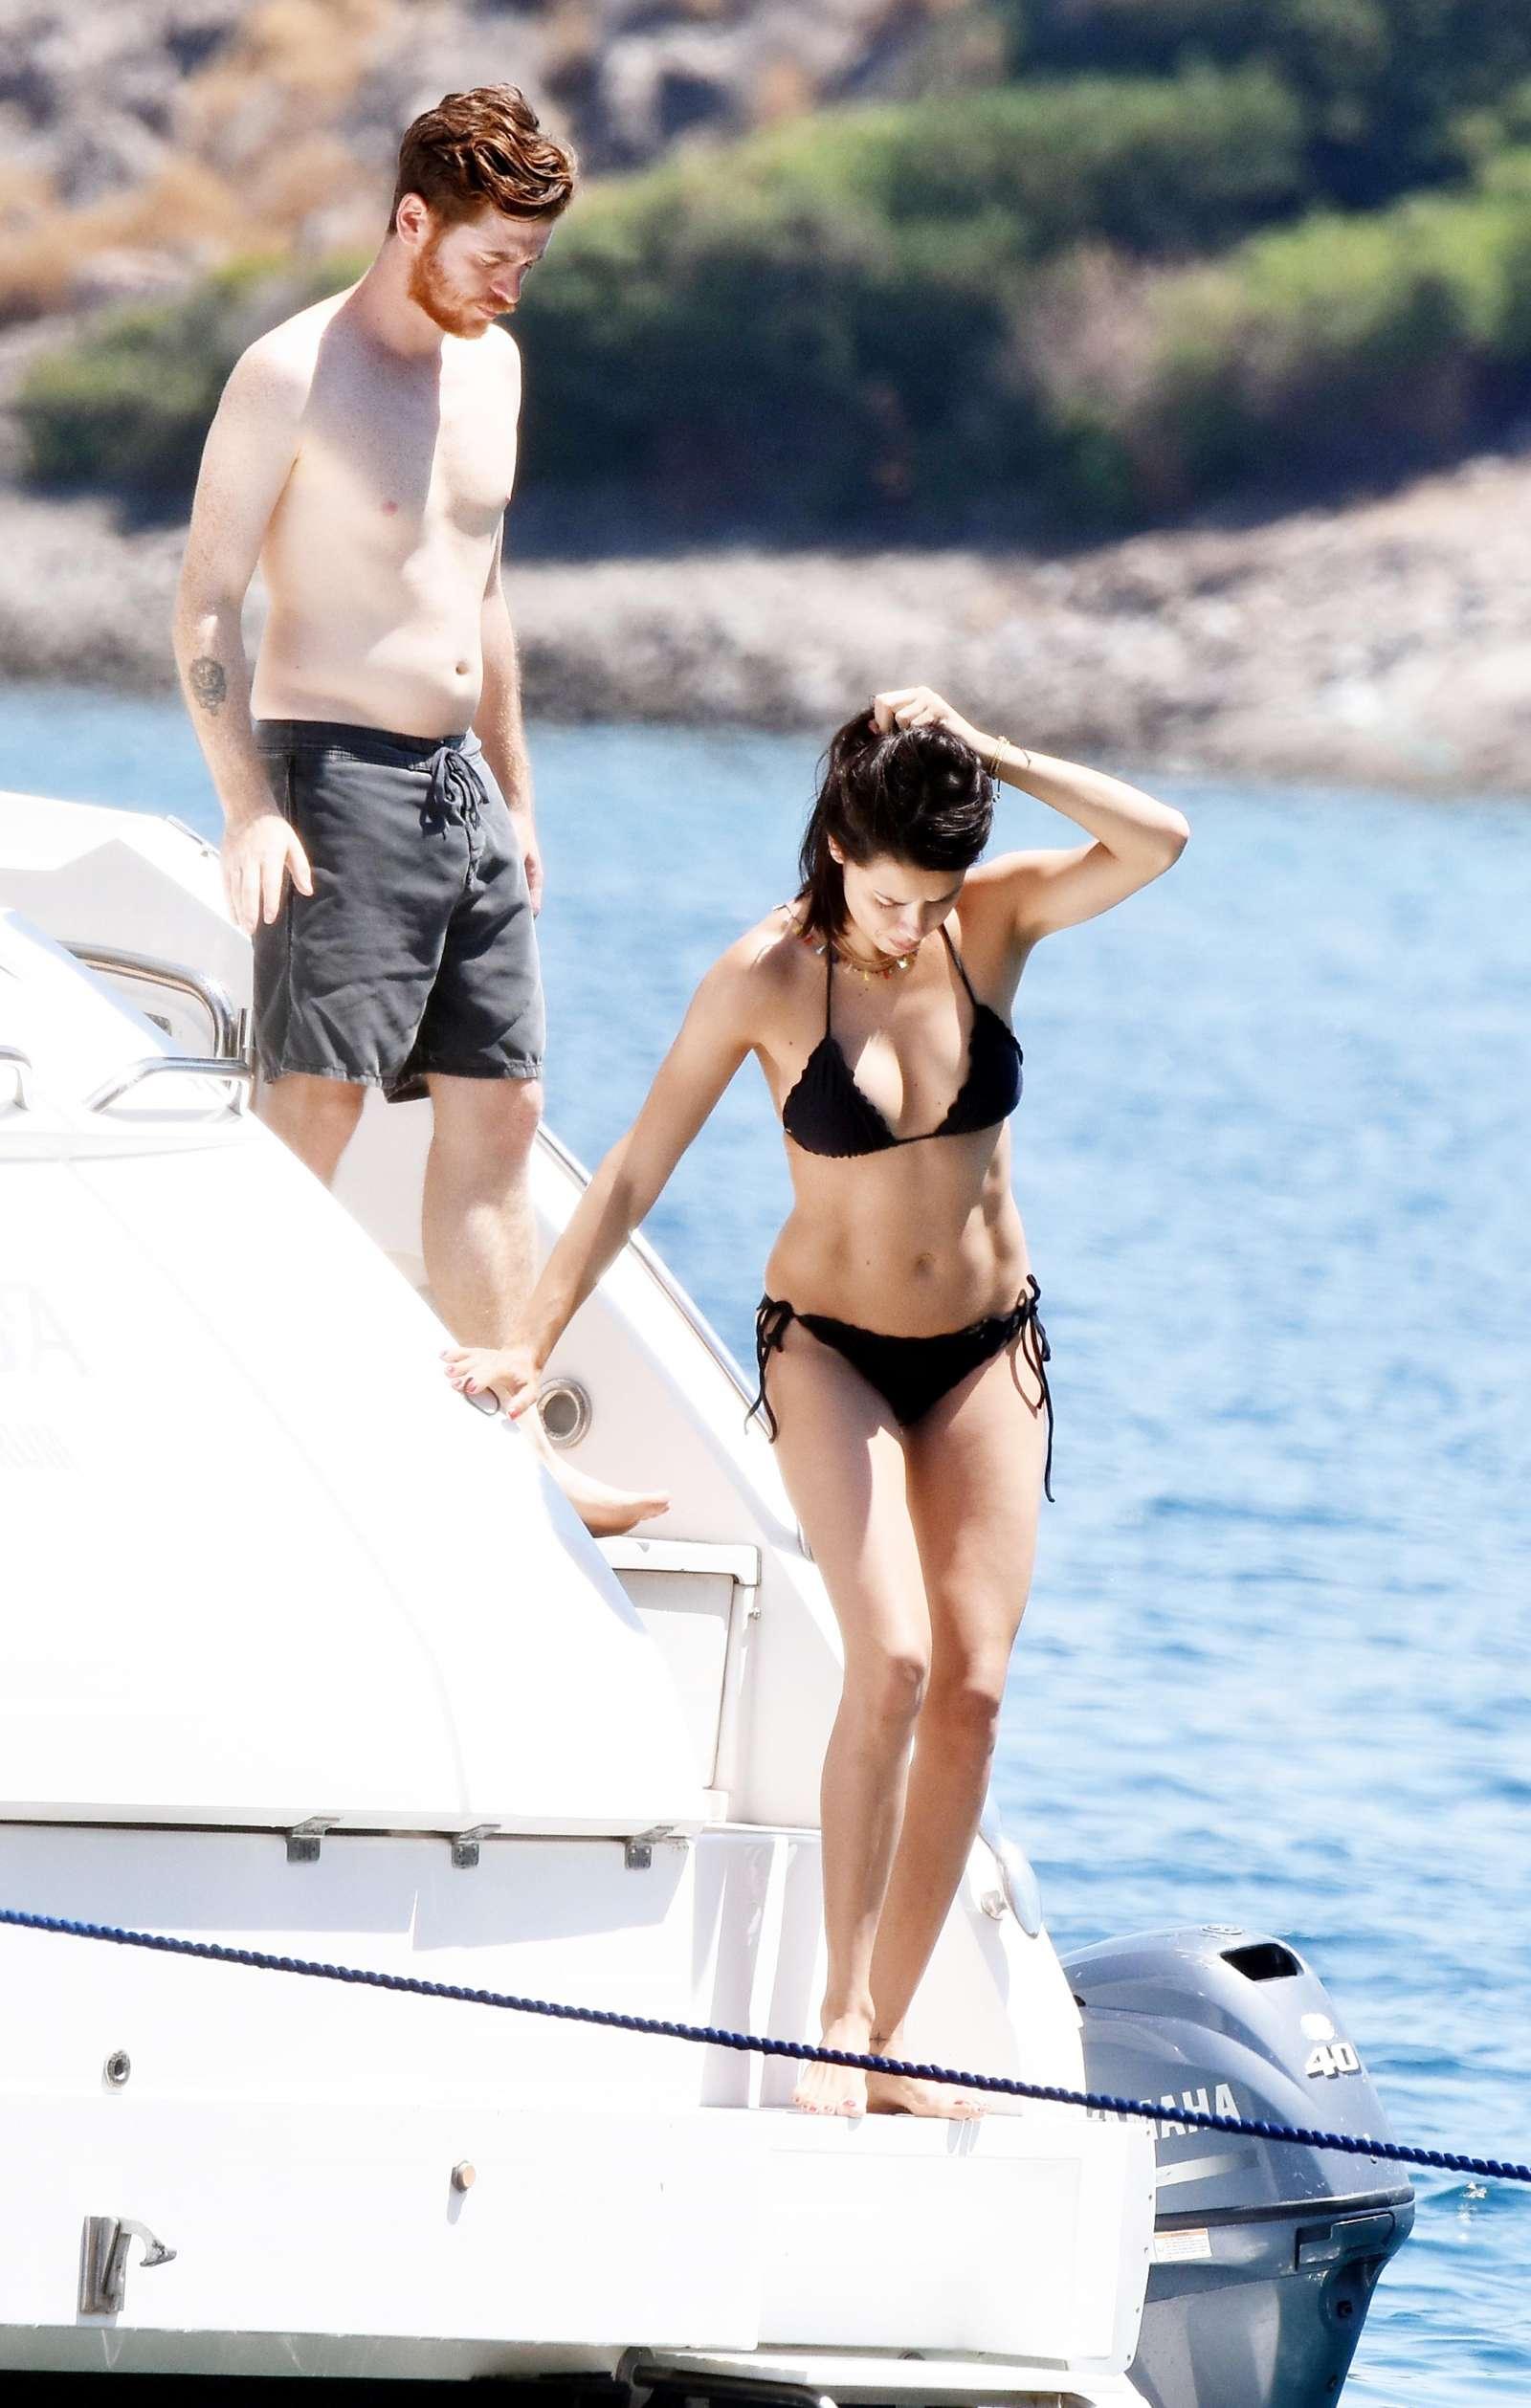 Adriana Lima in Black Bikini on a Yacht in Bodrum